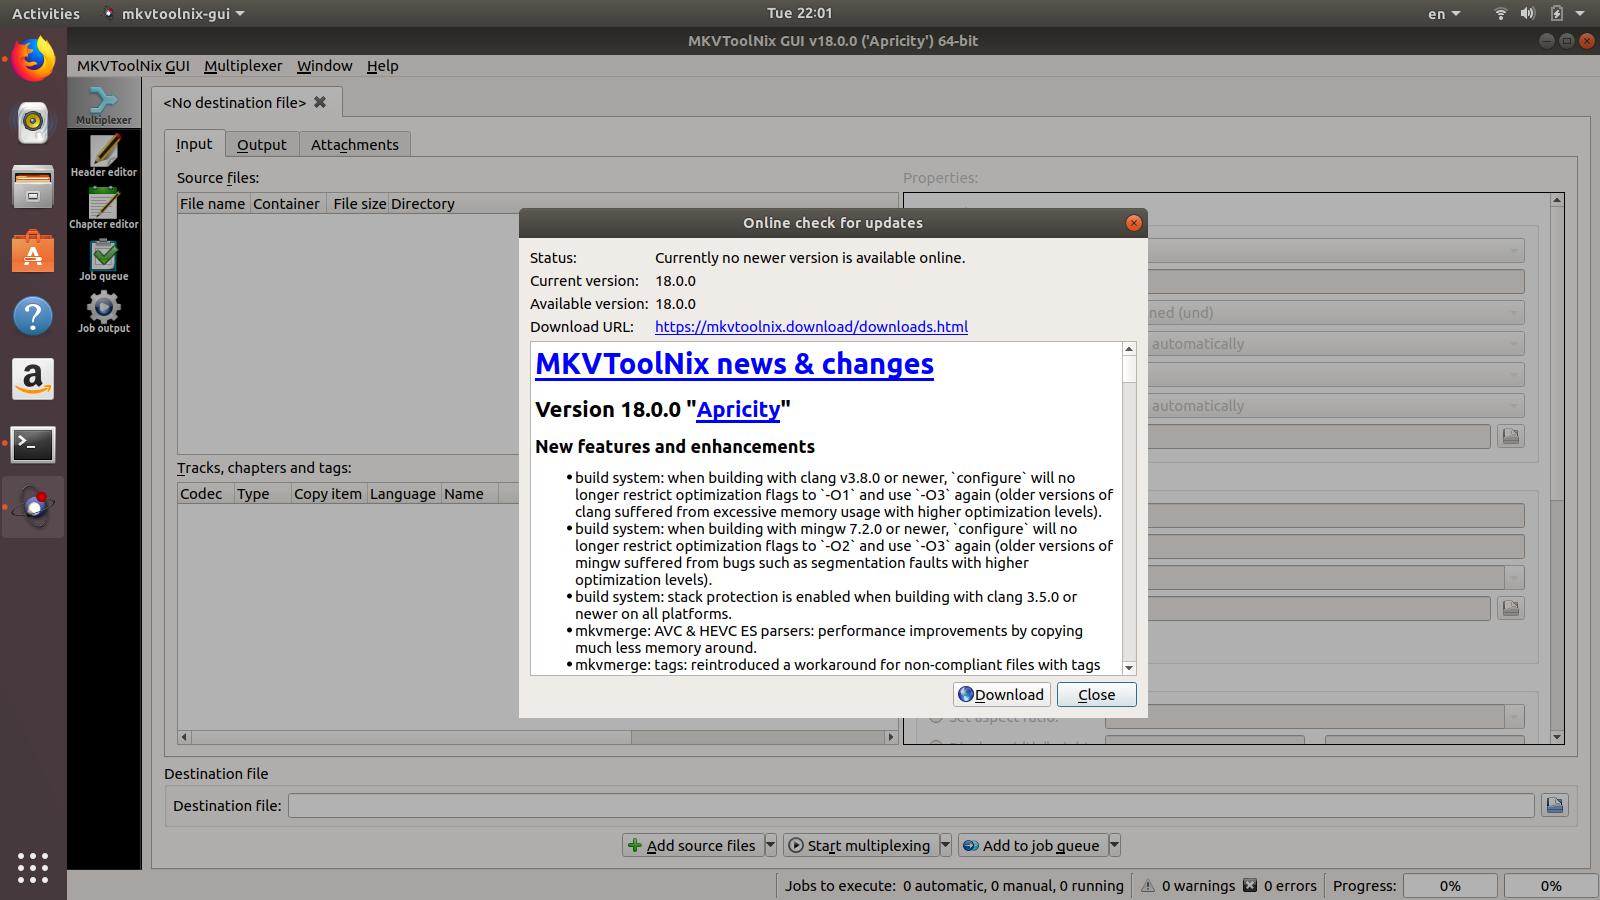 How to install program on Ubuntu: How to Install MKVToolNix